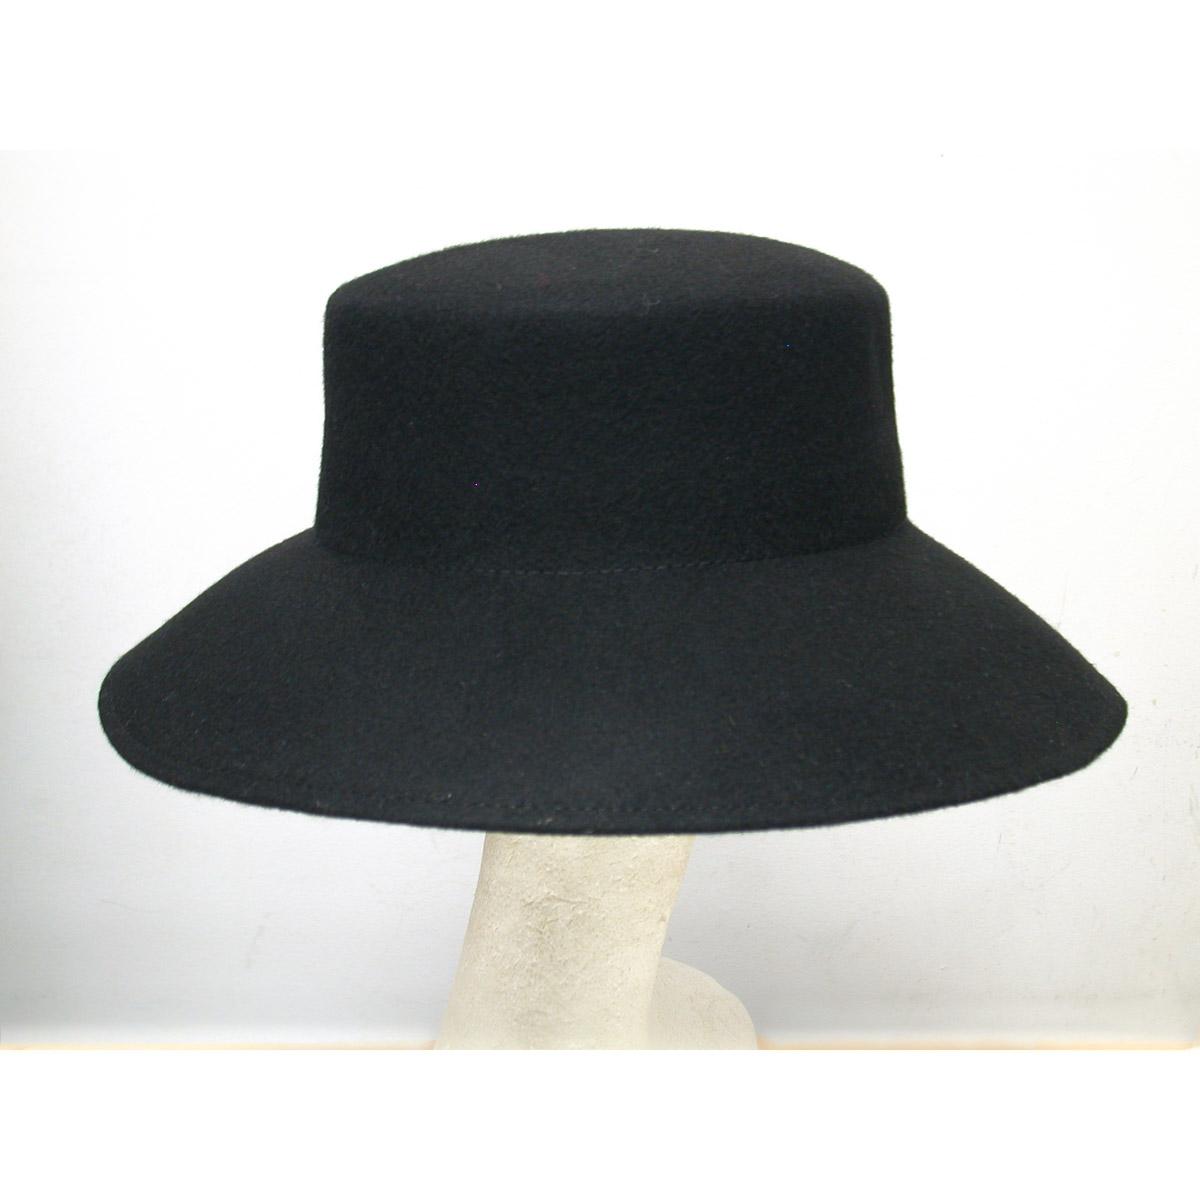 4e0de78f1b0d9 Black Lampshade Flat Top Felt Plain Hats-W0104A-BLACK- Sun Yorkos ...